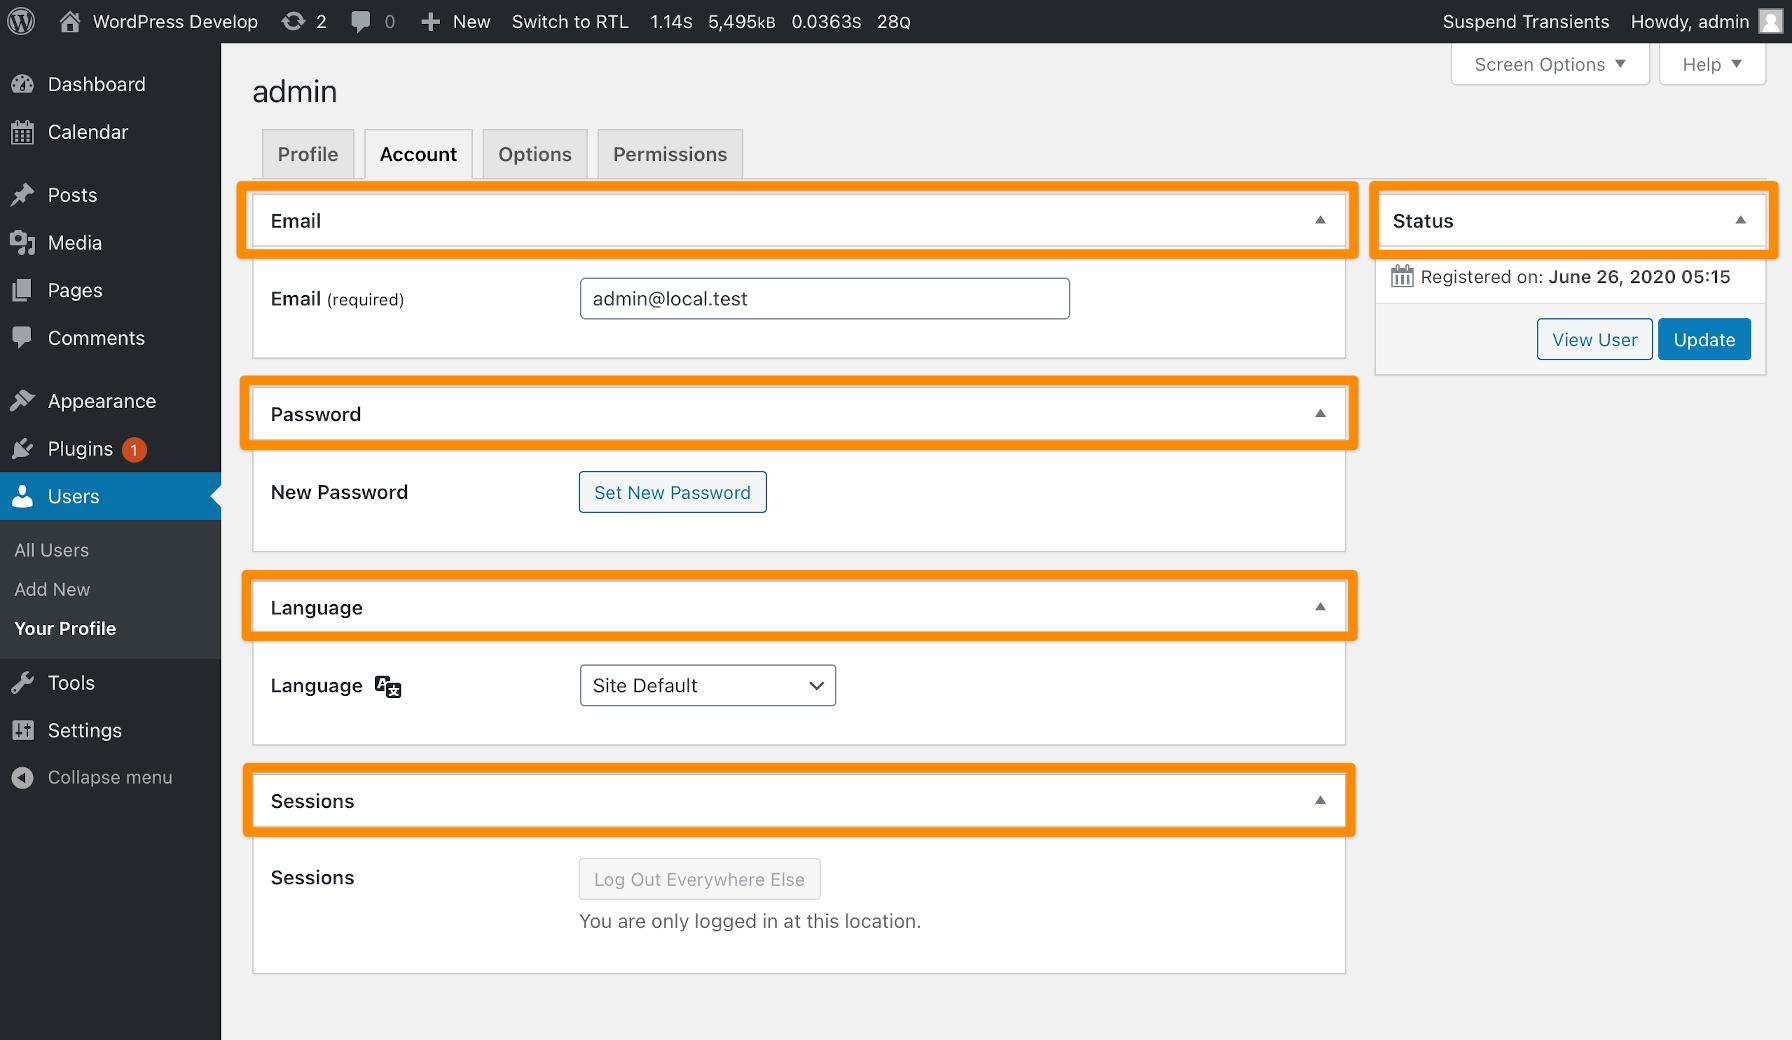 Boîtes méta de l'écran d'administration personnalisé de WP User Profiles.